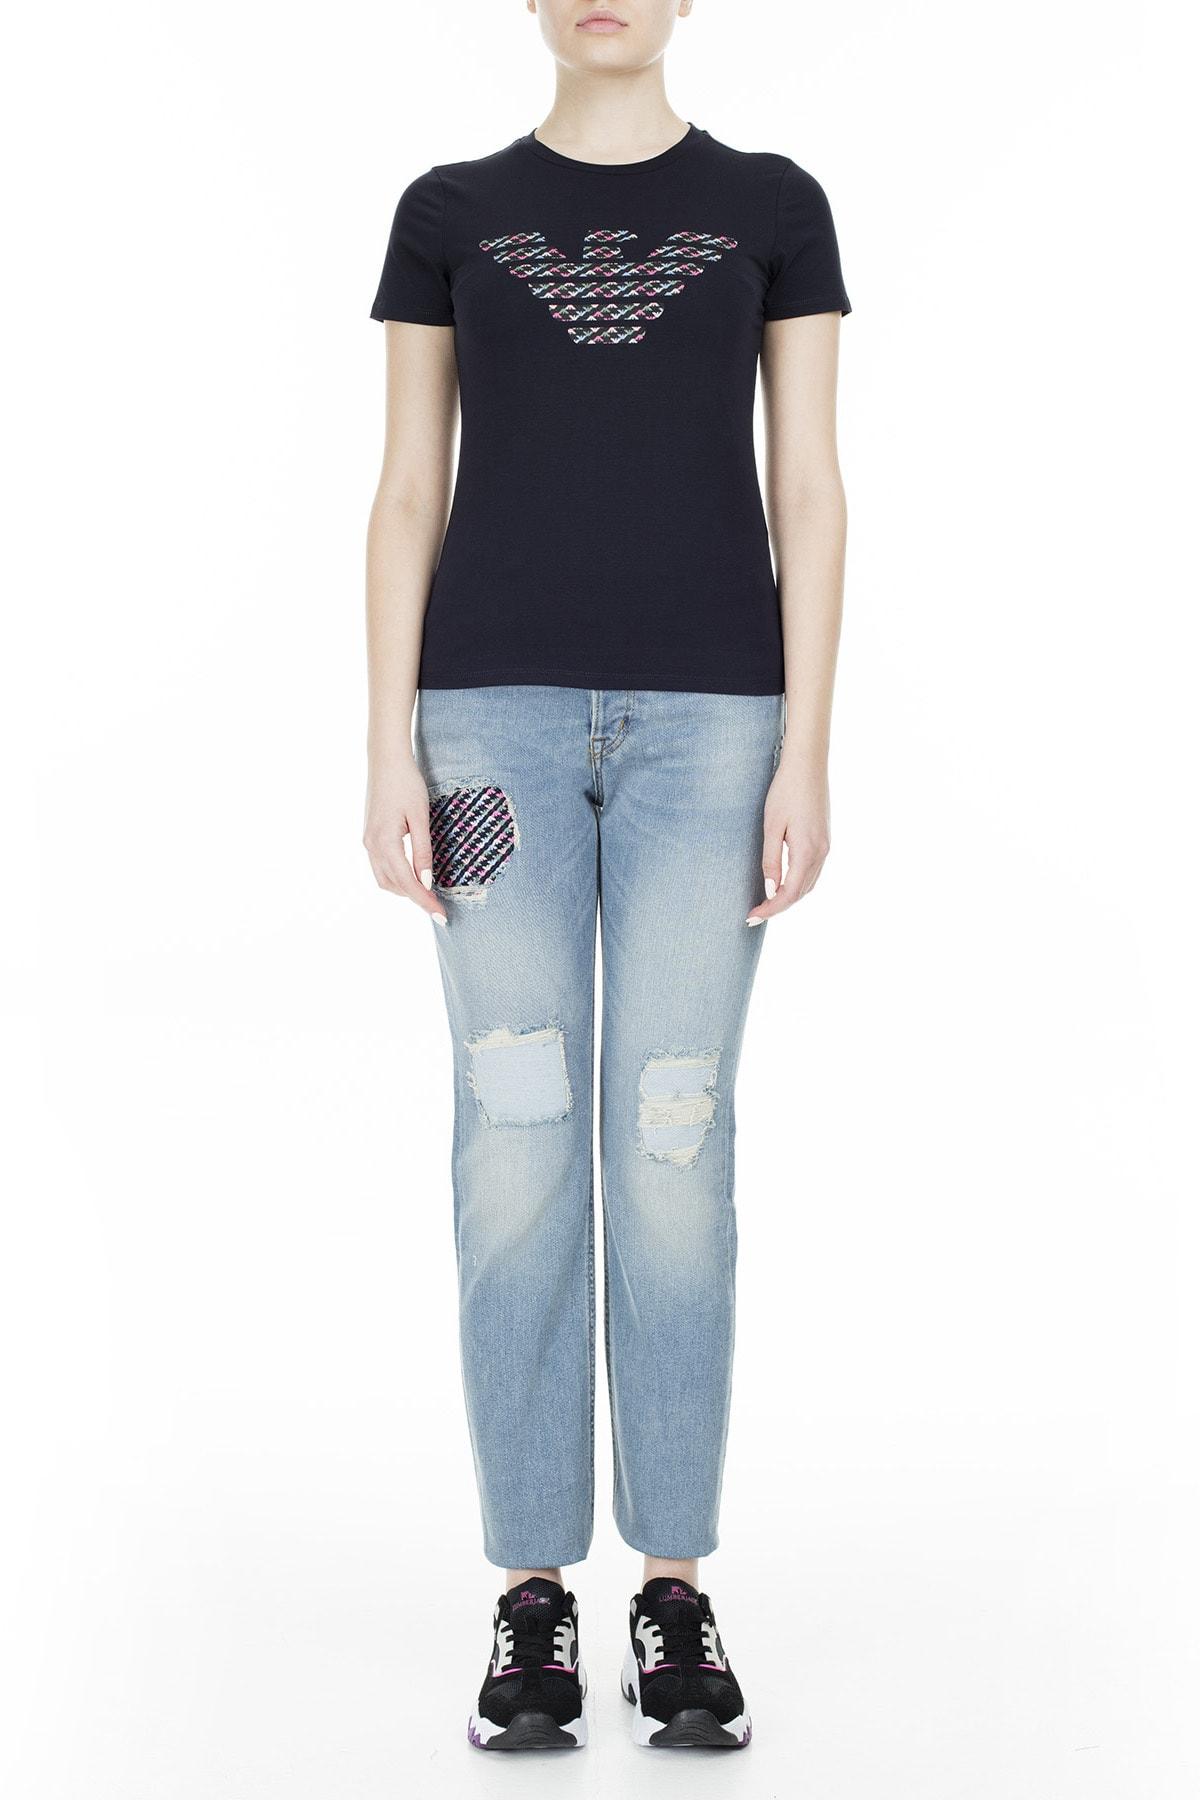 Emporio Armani T Shirt Kadın T Shirt S 6G2T7N 2J07Z 0927 S 6G2T7N 2J07Z 0927 4